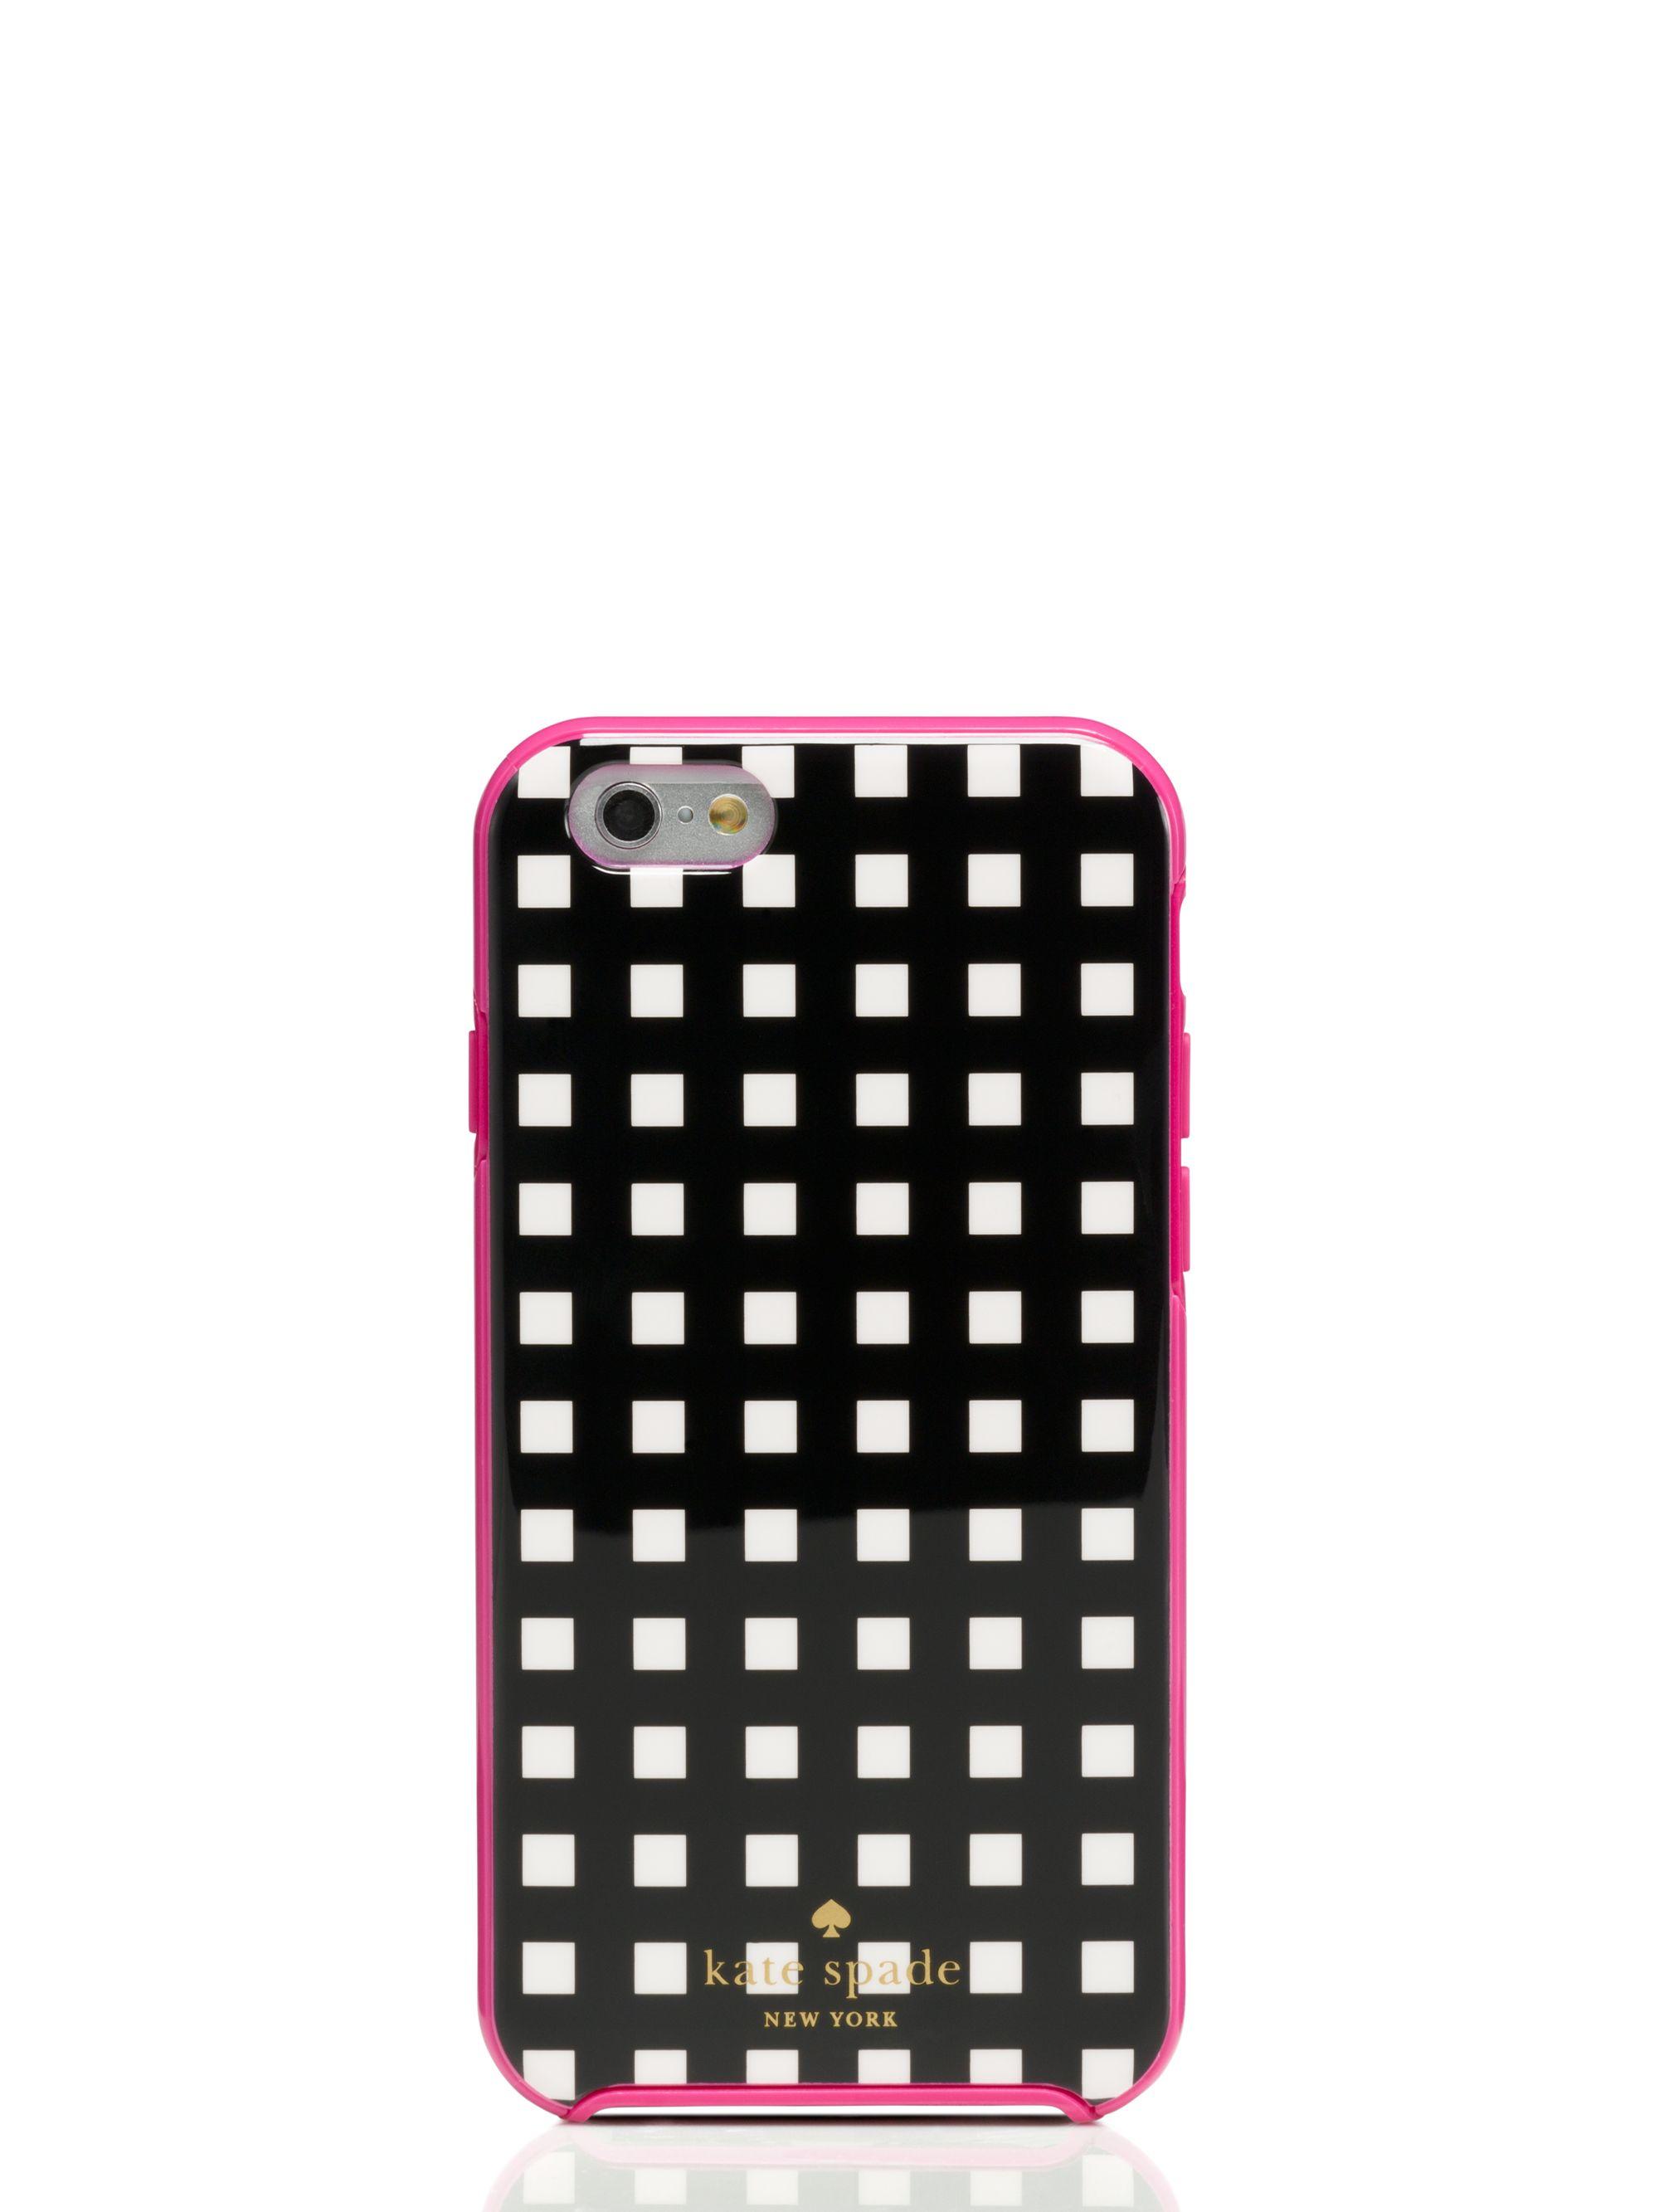 Kate Spade Iphone  Case Australia